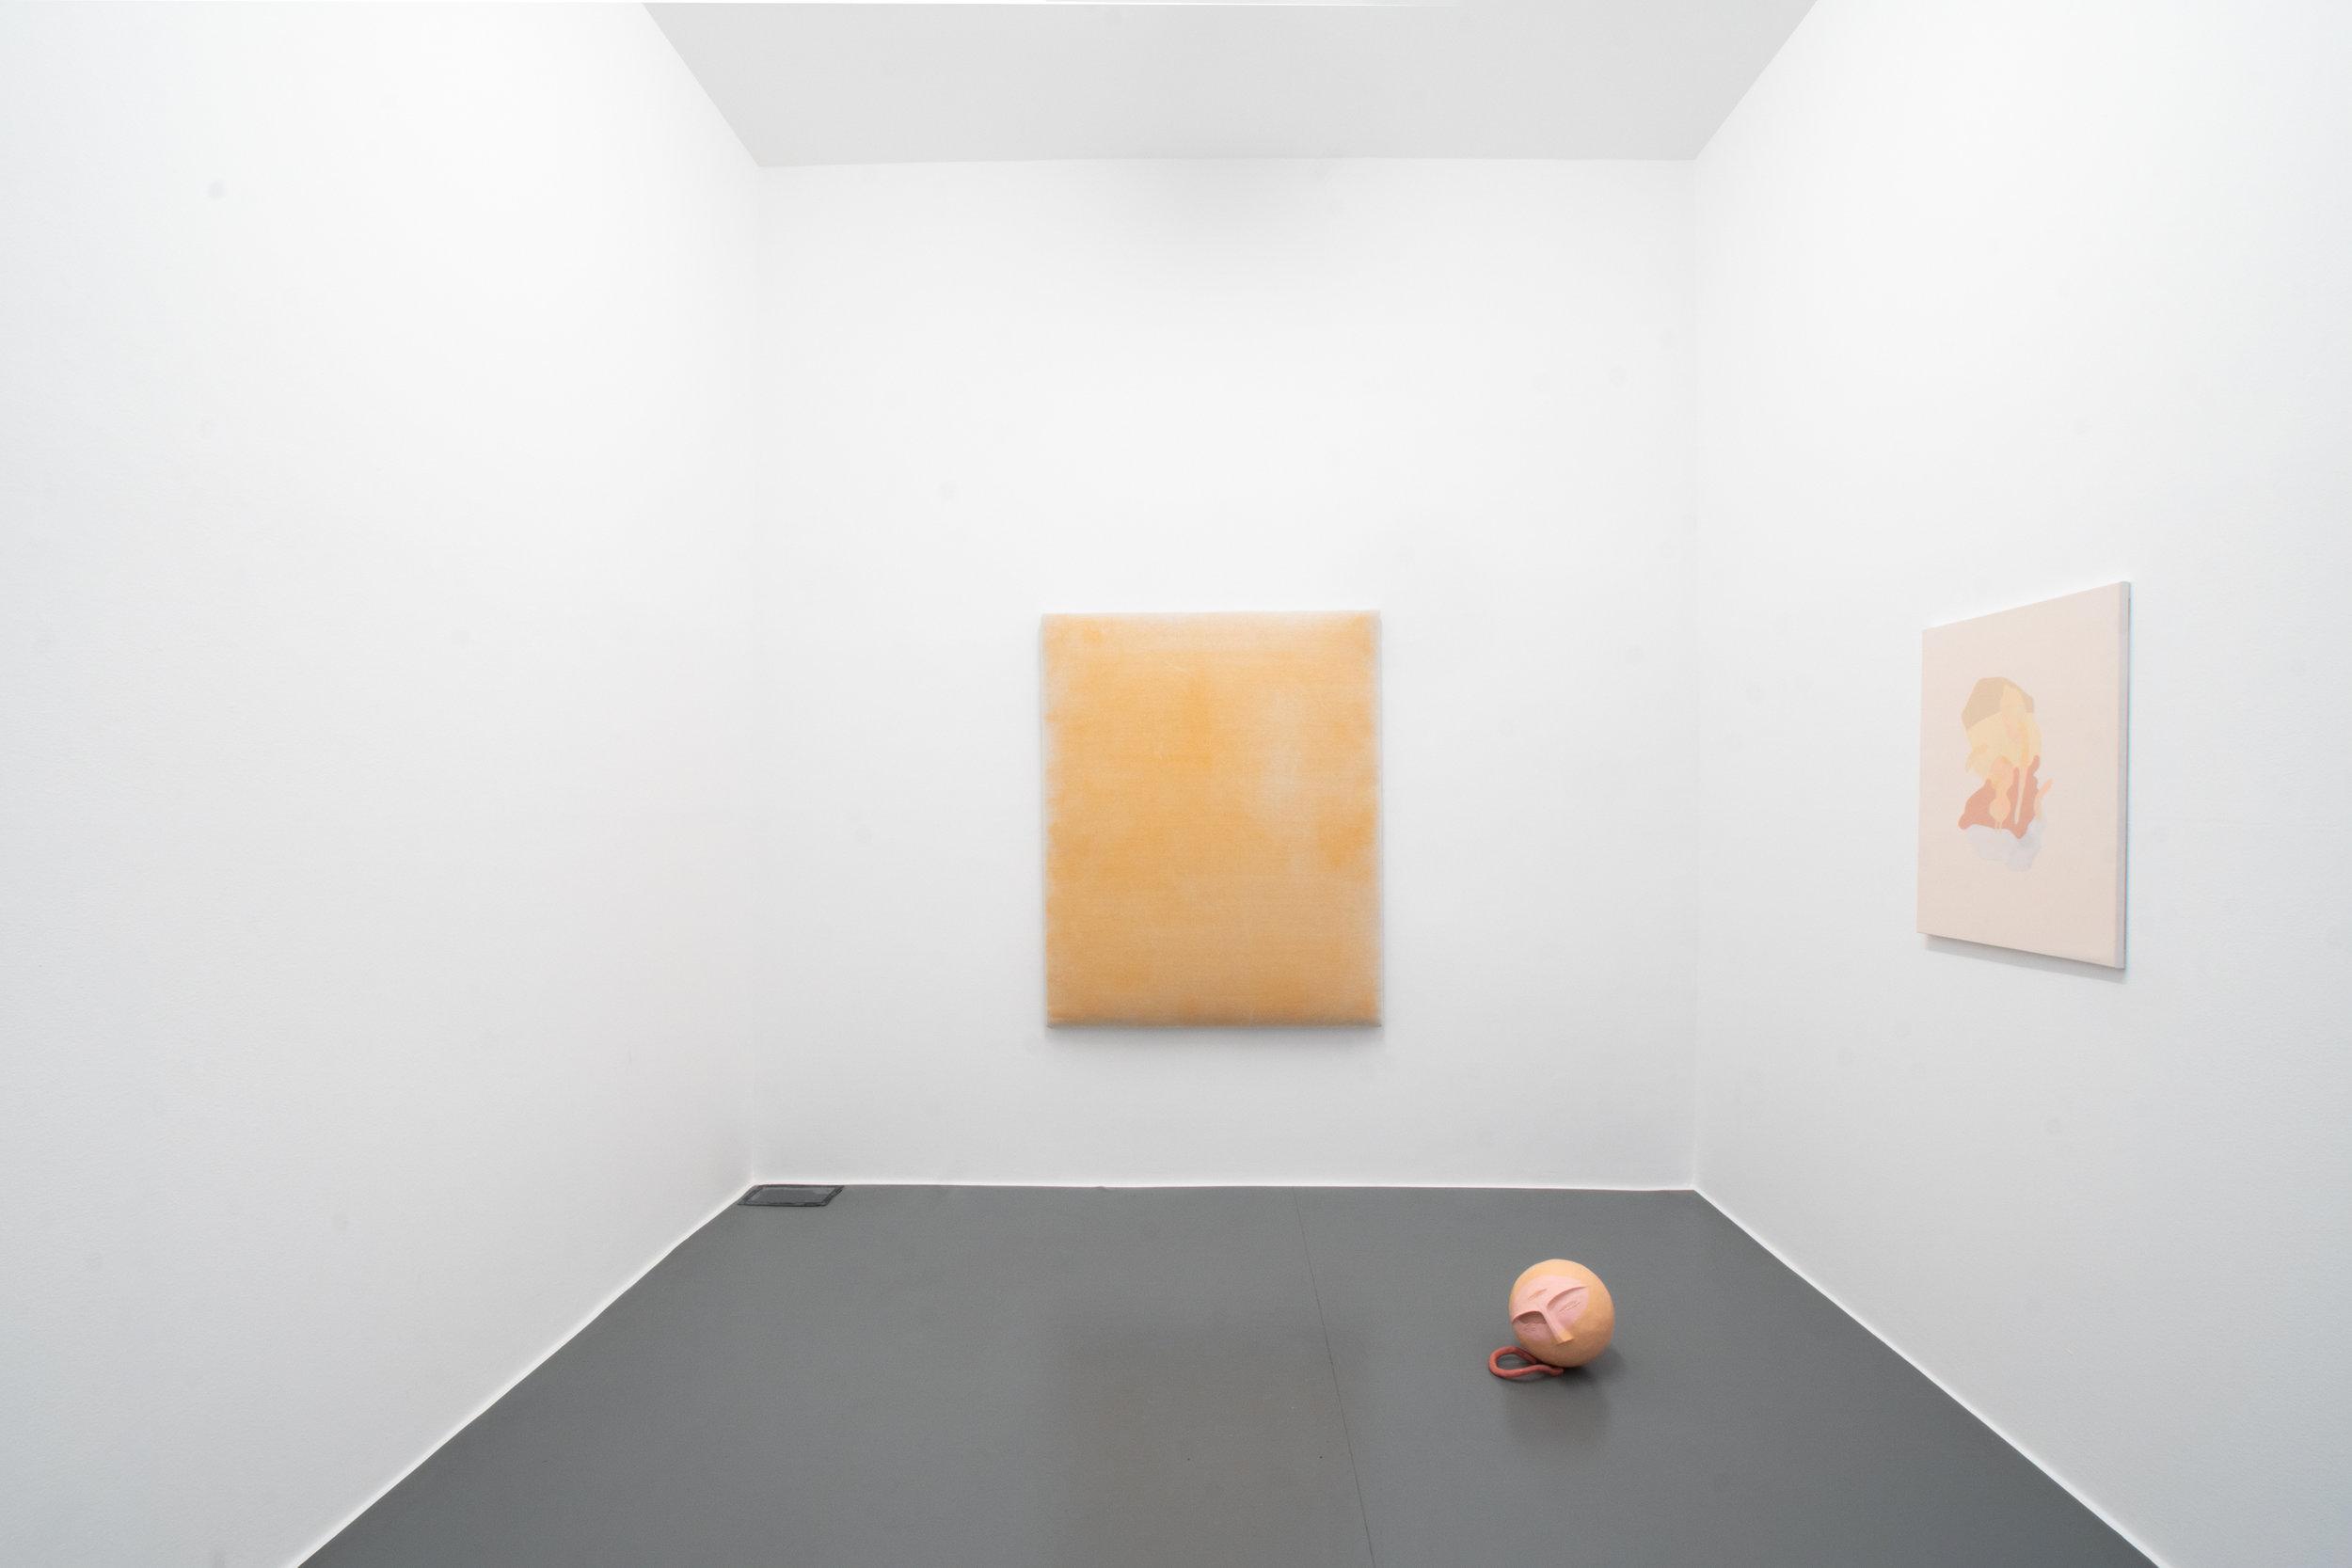 11 Gioia Di Girolamo - The Mating Season of Frenzy Breeze, Galleria Bianconi (ph Massimiliano Costantini).jpg